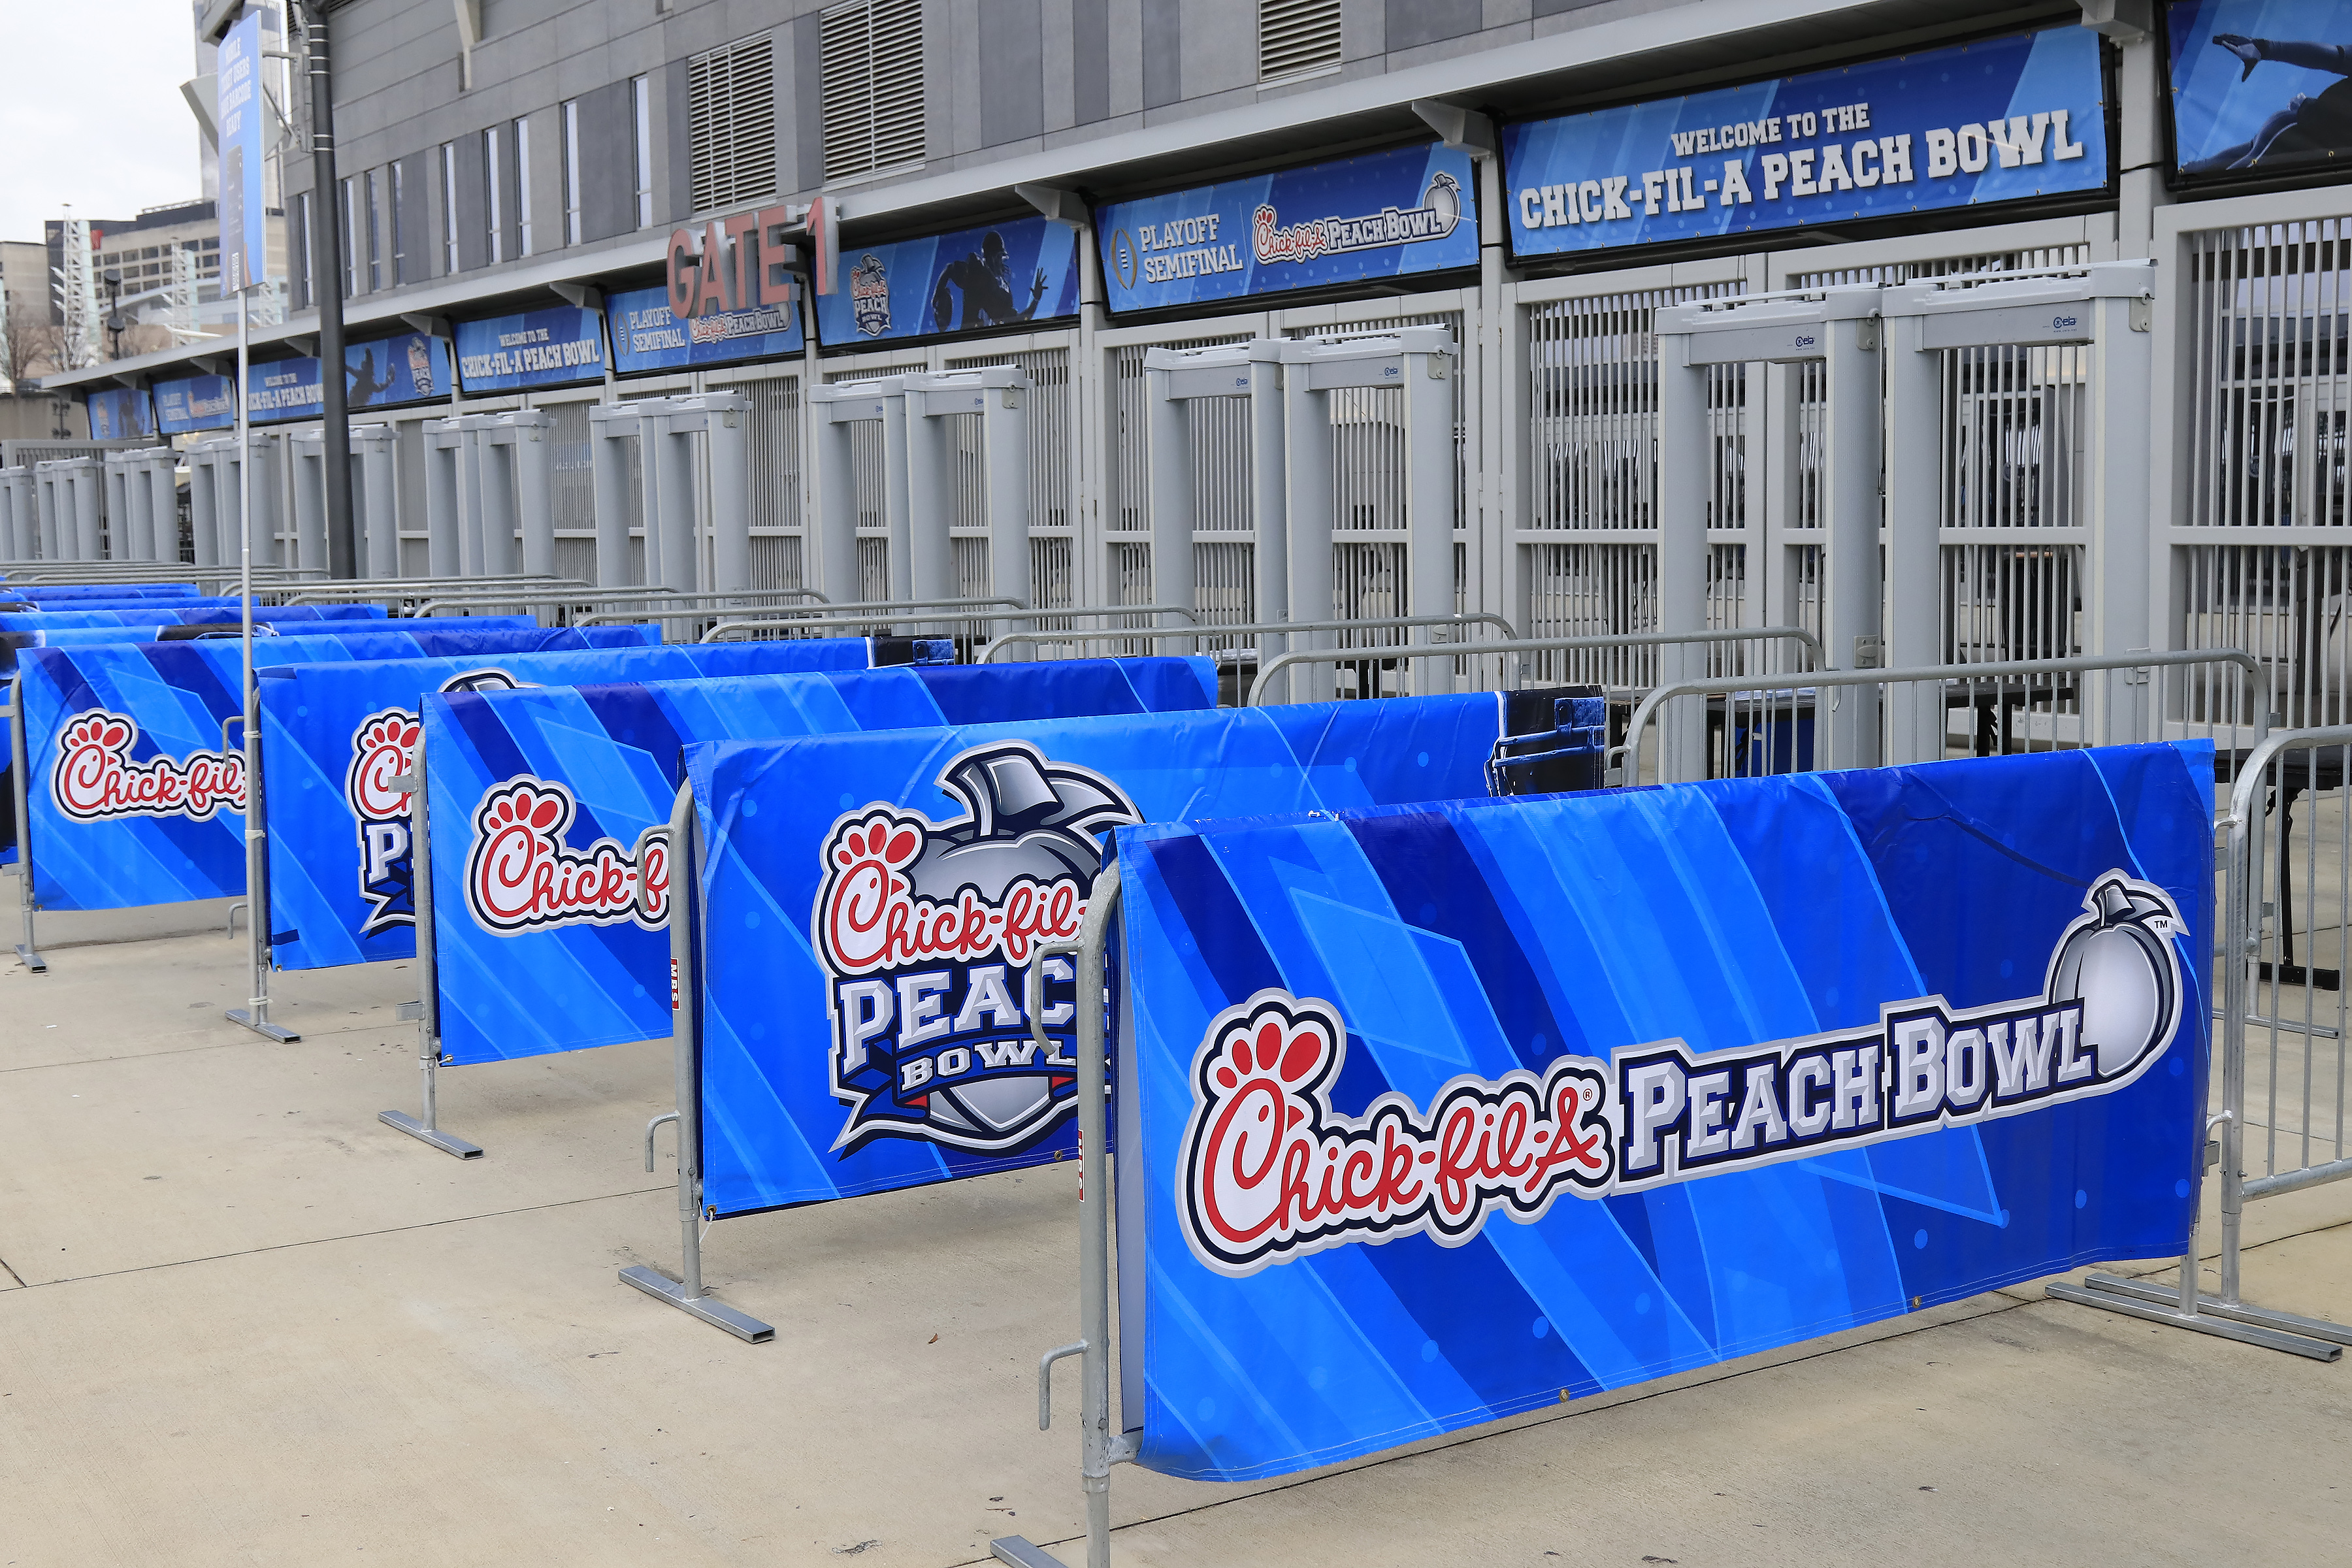 COLLEGE FOOTBALL: DEC 28 CFP Semifinal at the Chick-fil-A Peach Bowl - Oklahoma v LSU